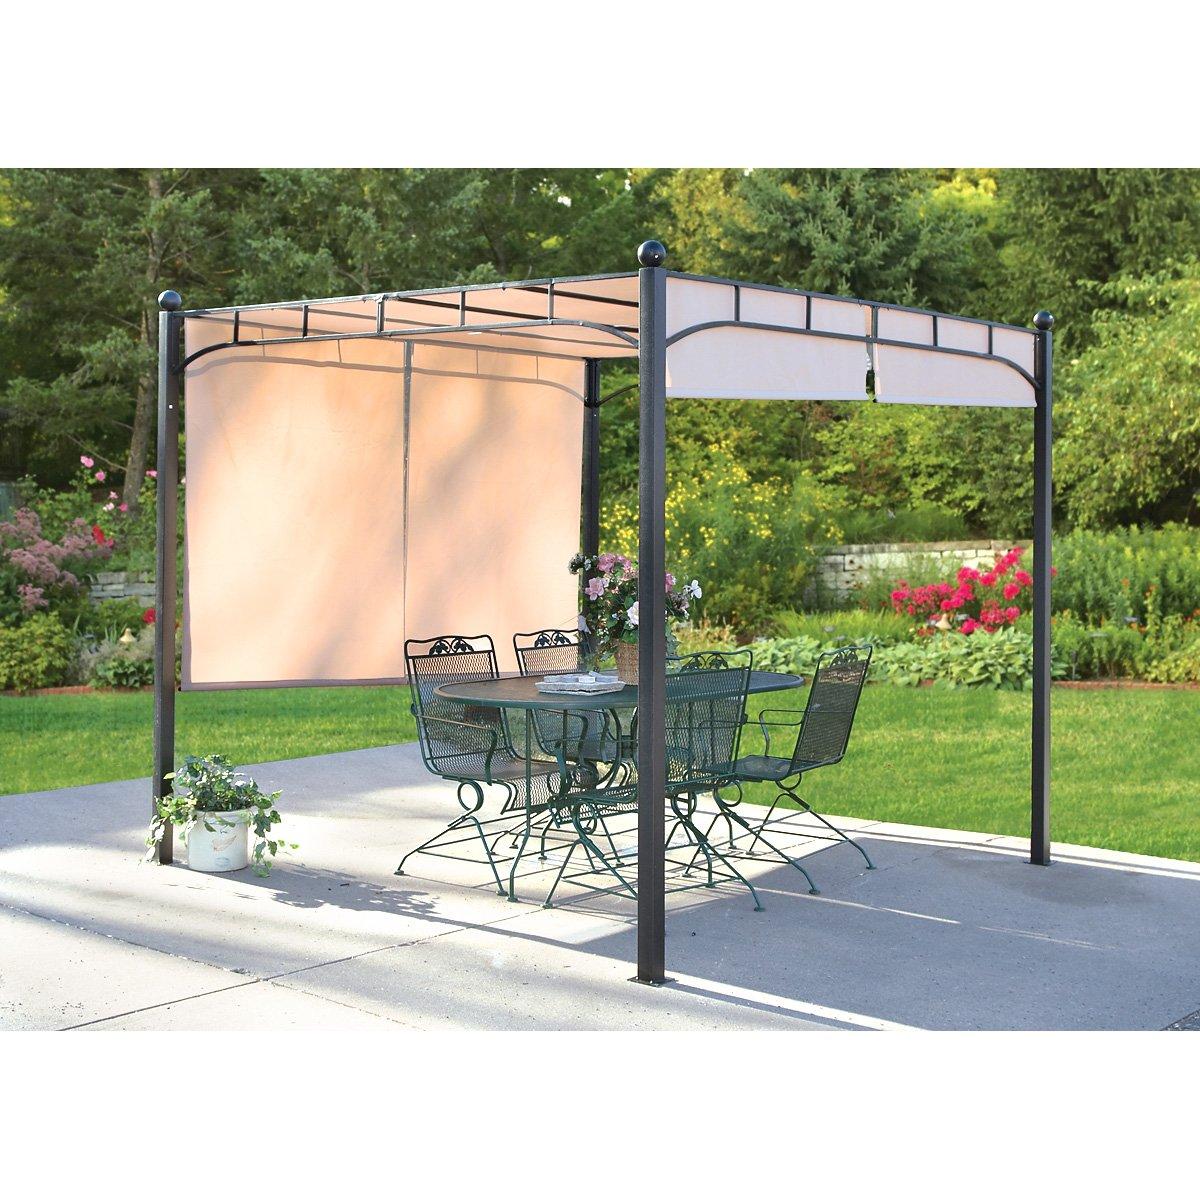 Amazon.com : CASTLECREEK Freestanding Pergola with Adjustable Shade &  Canopy : Patio, Lawn & Garden - Amazon.com : CASTLECREEK Freestanding Pergola With Adjustable